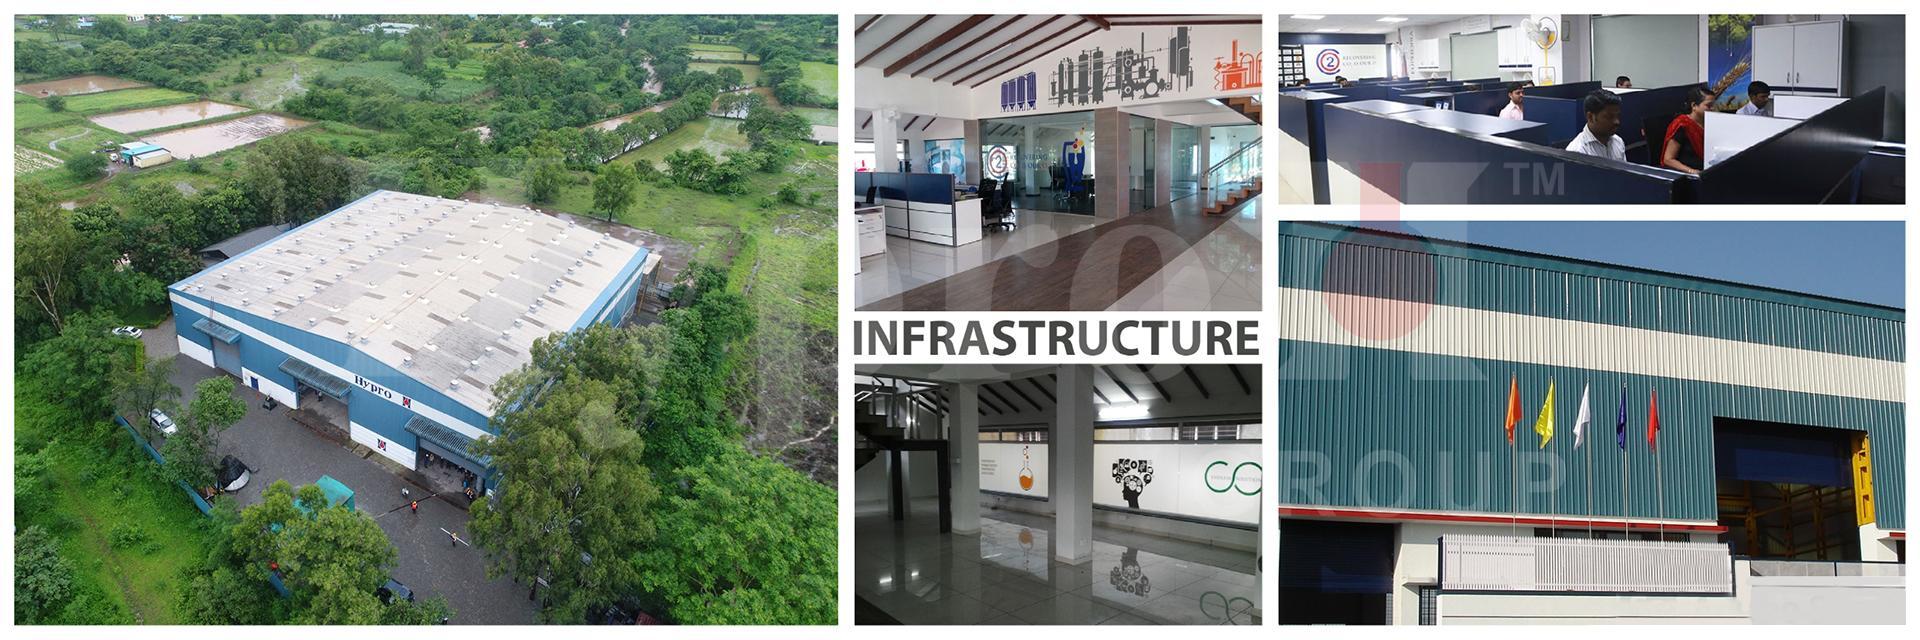 Infrastructure Hypro